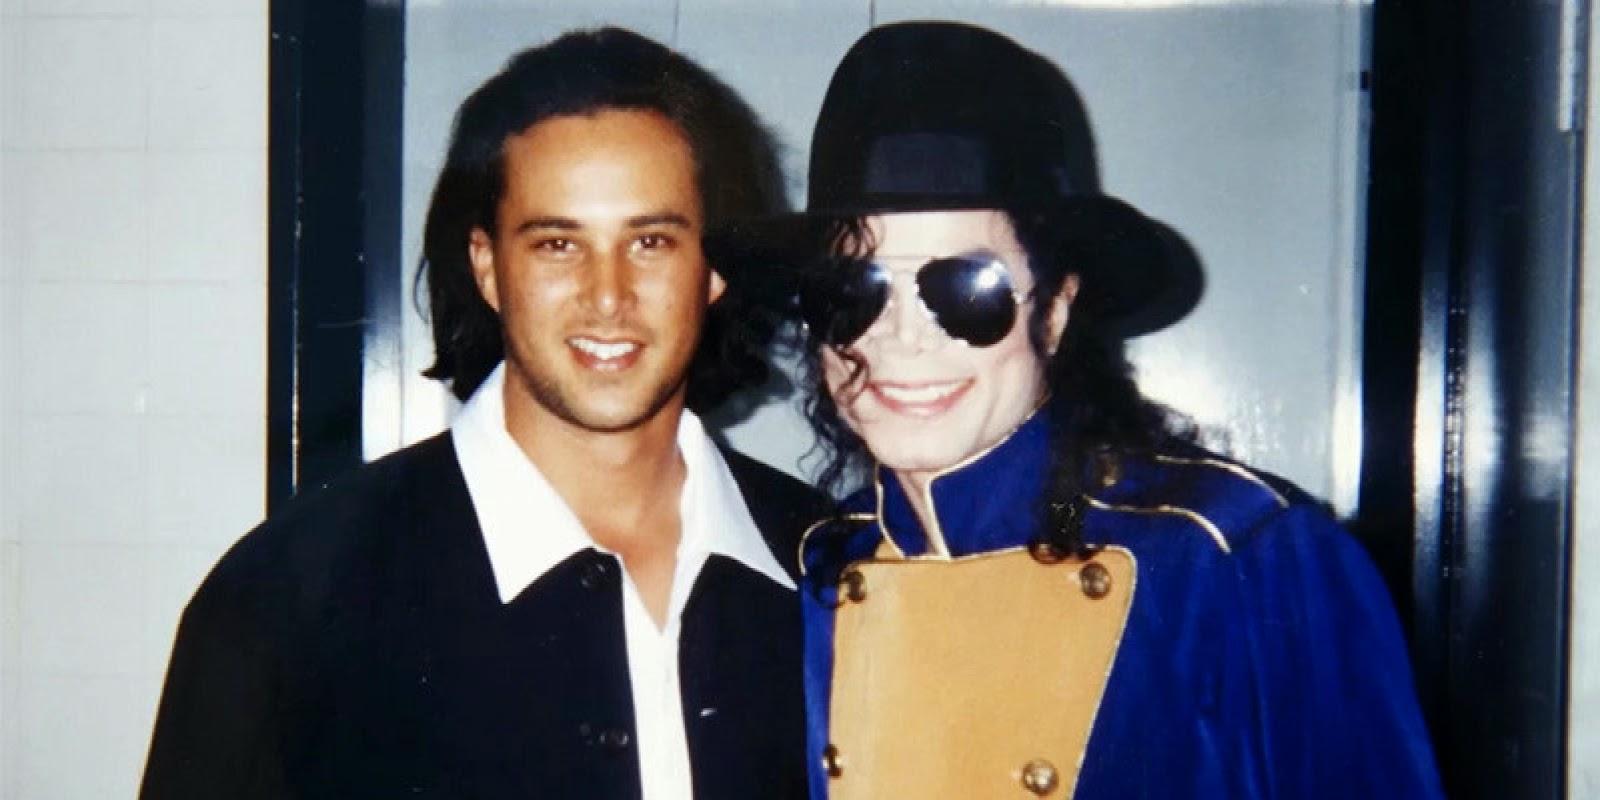 b7248fd3341c2 Cris Judd with Michael Jackson